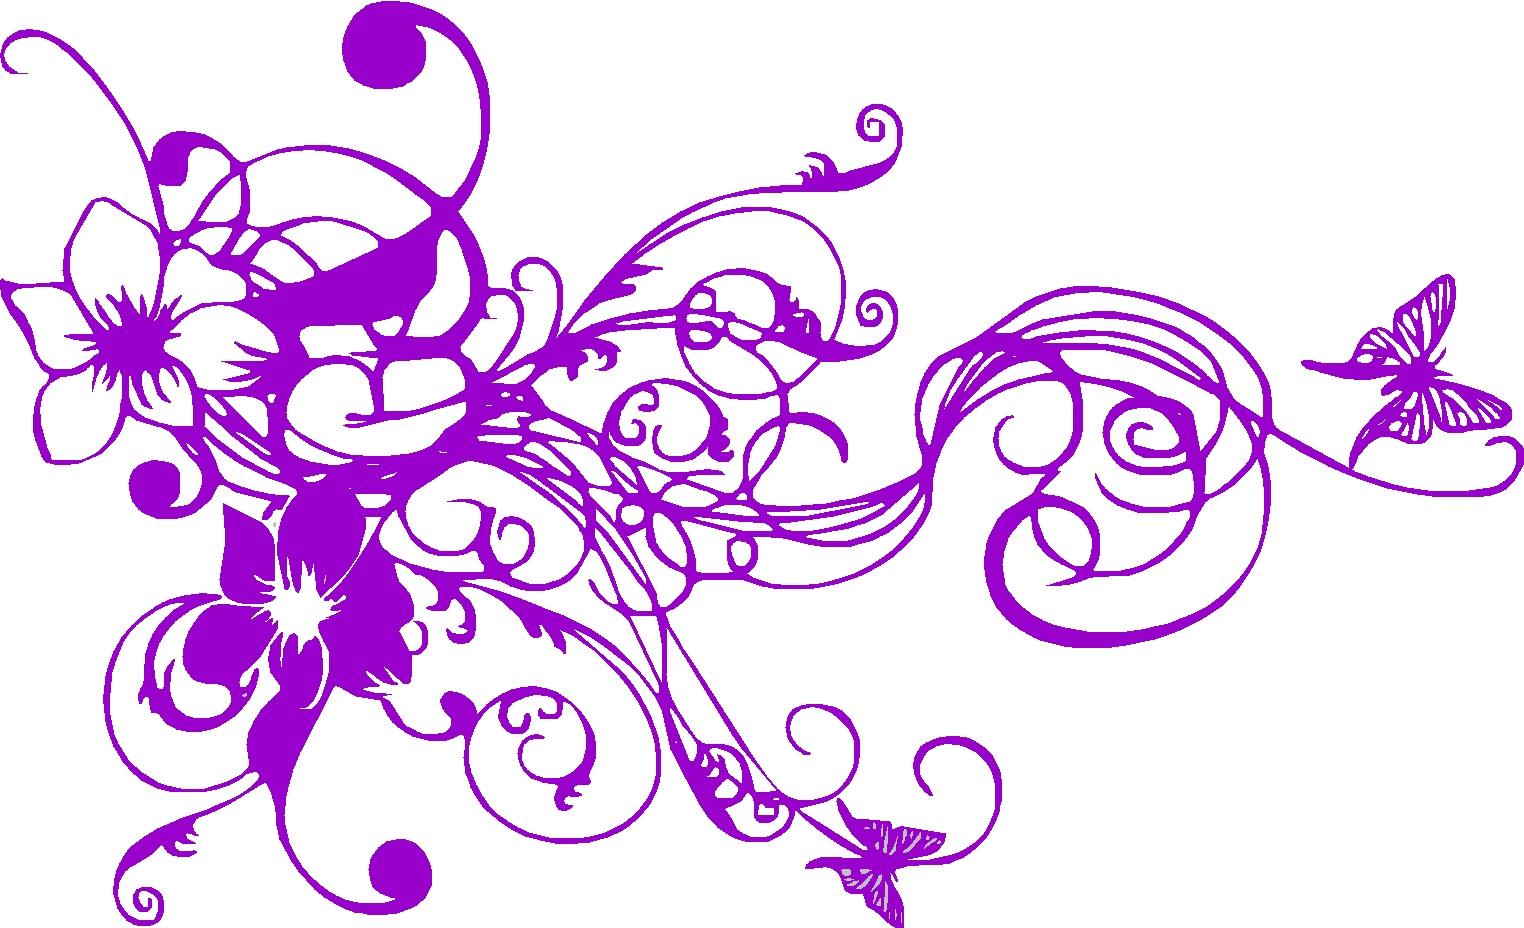 flowers and swirls designs - photo #36